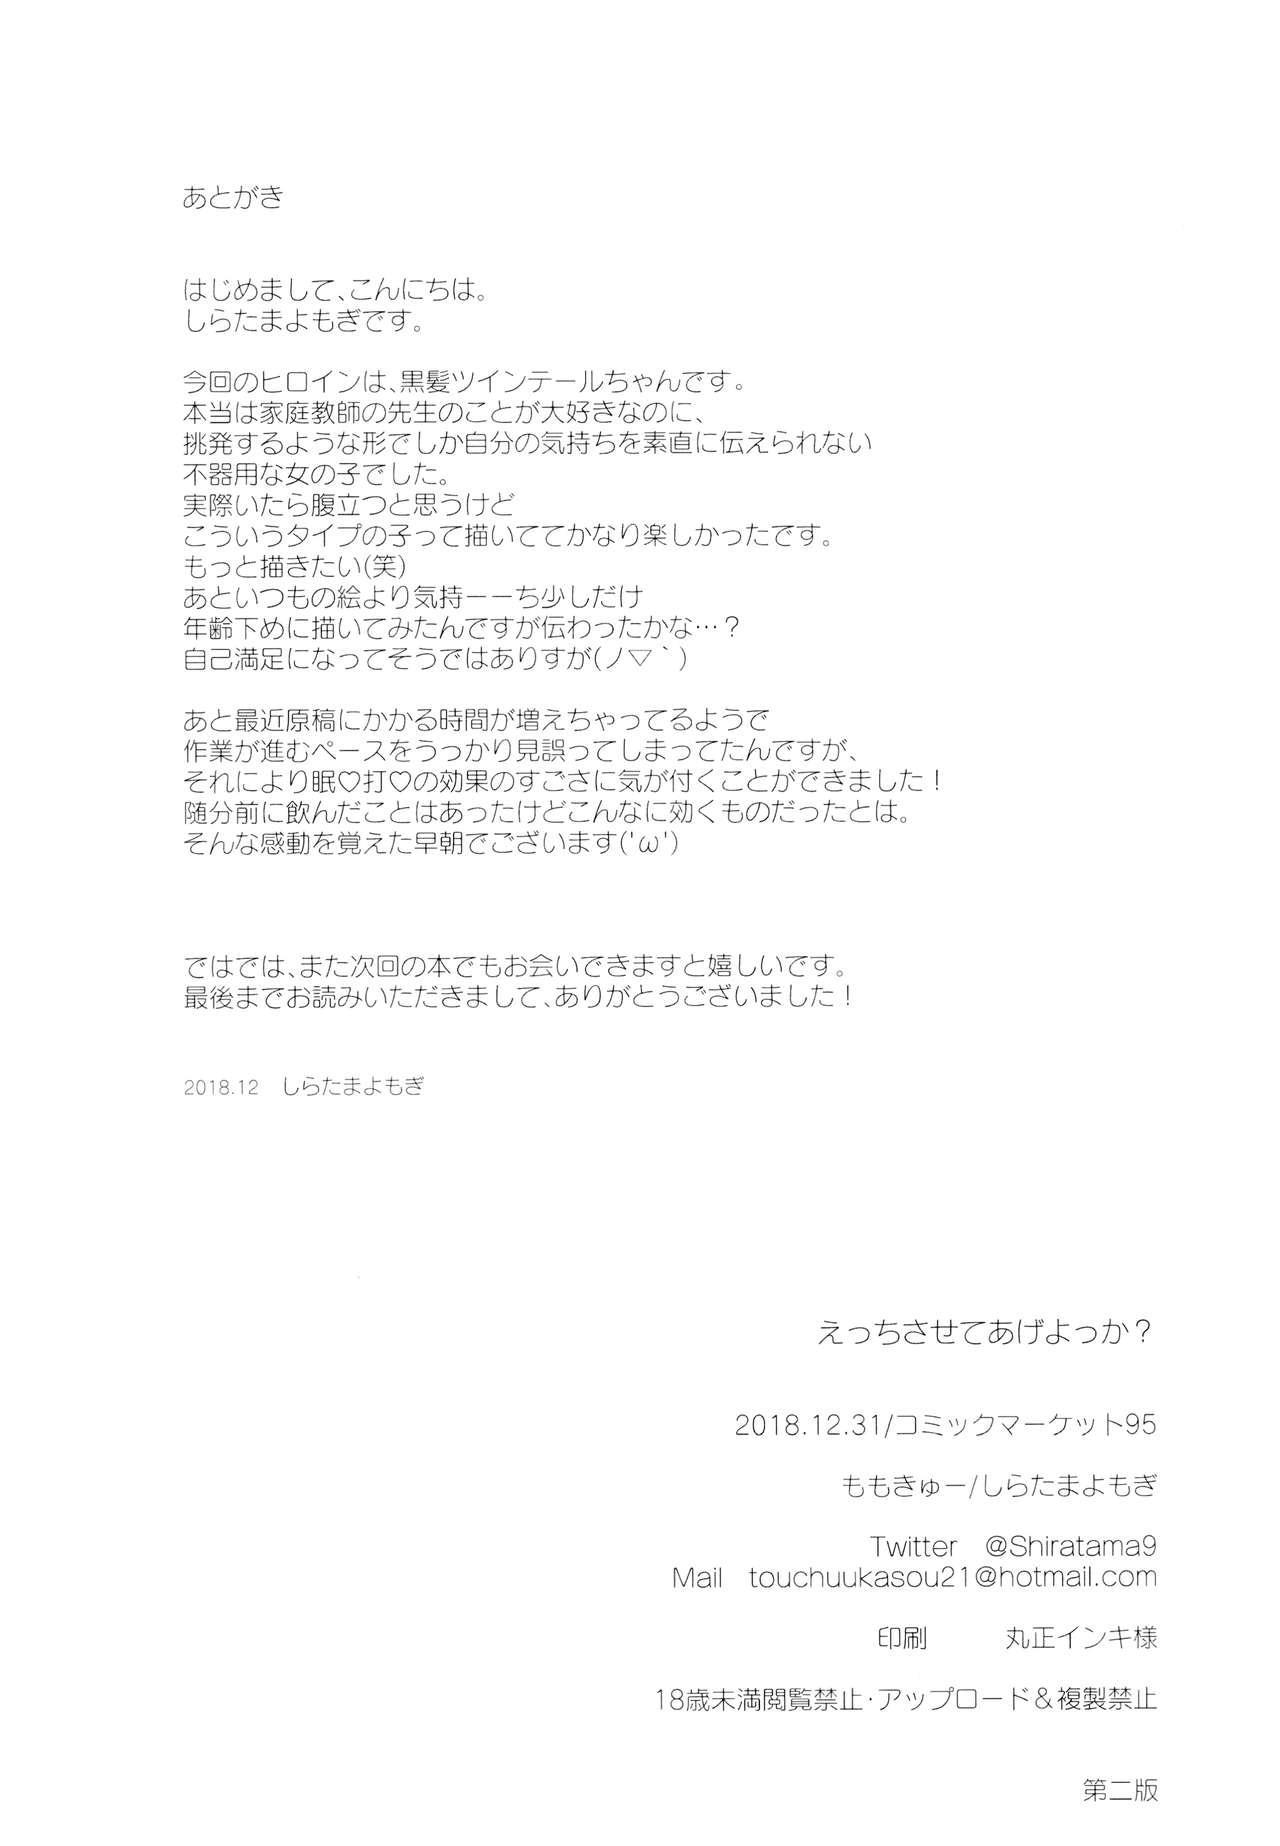 Ecchi Sasete Ageyokka? 23